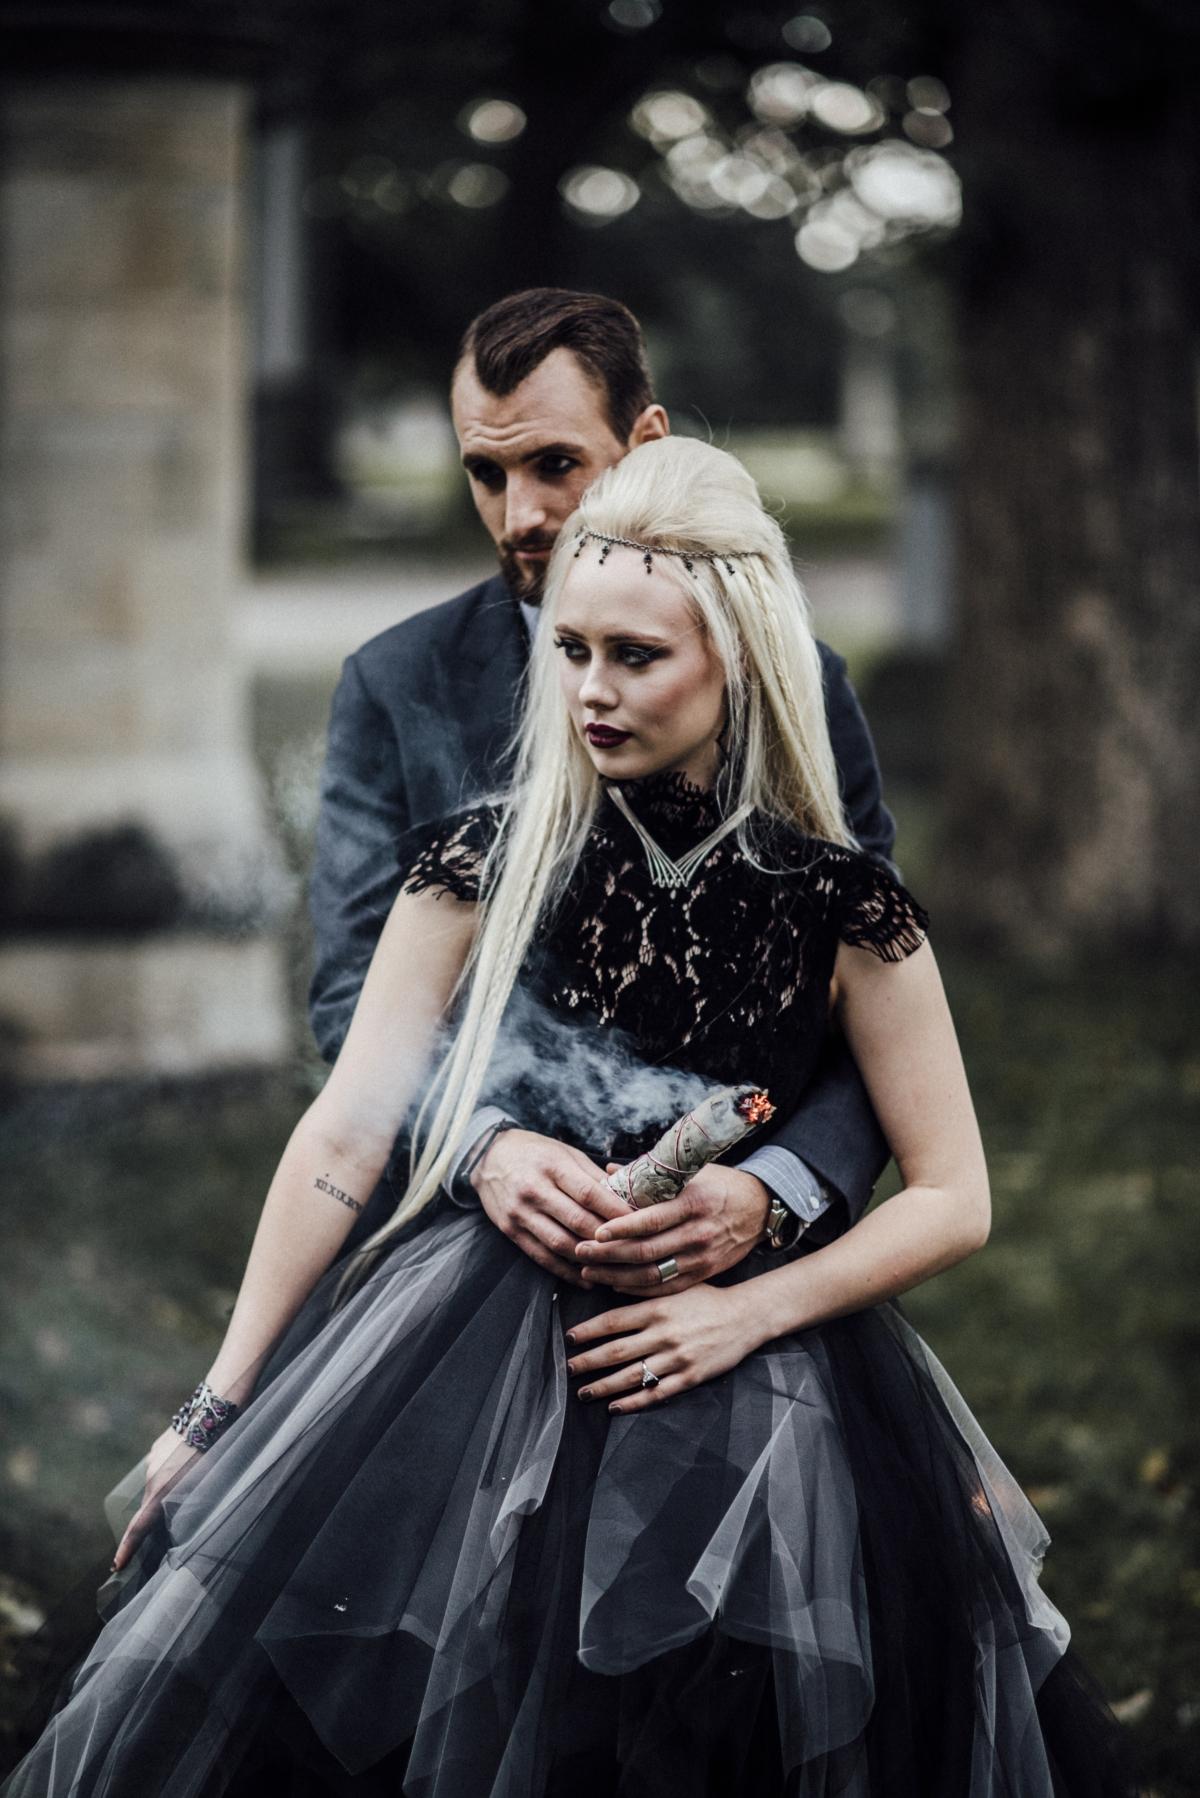 Wiccan Wedding Ideas Halloween Chicago